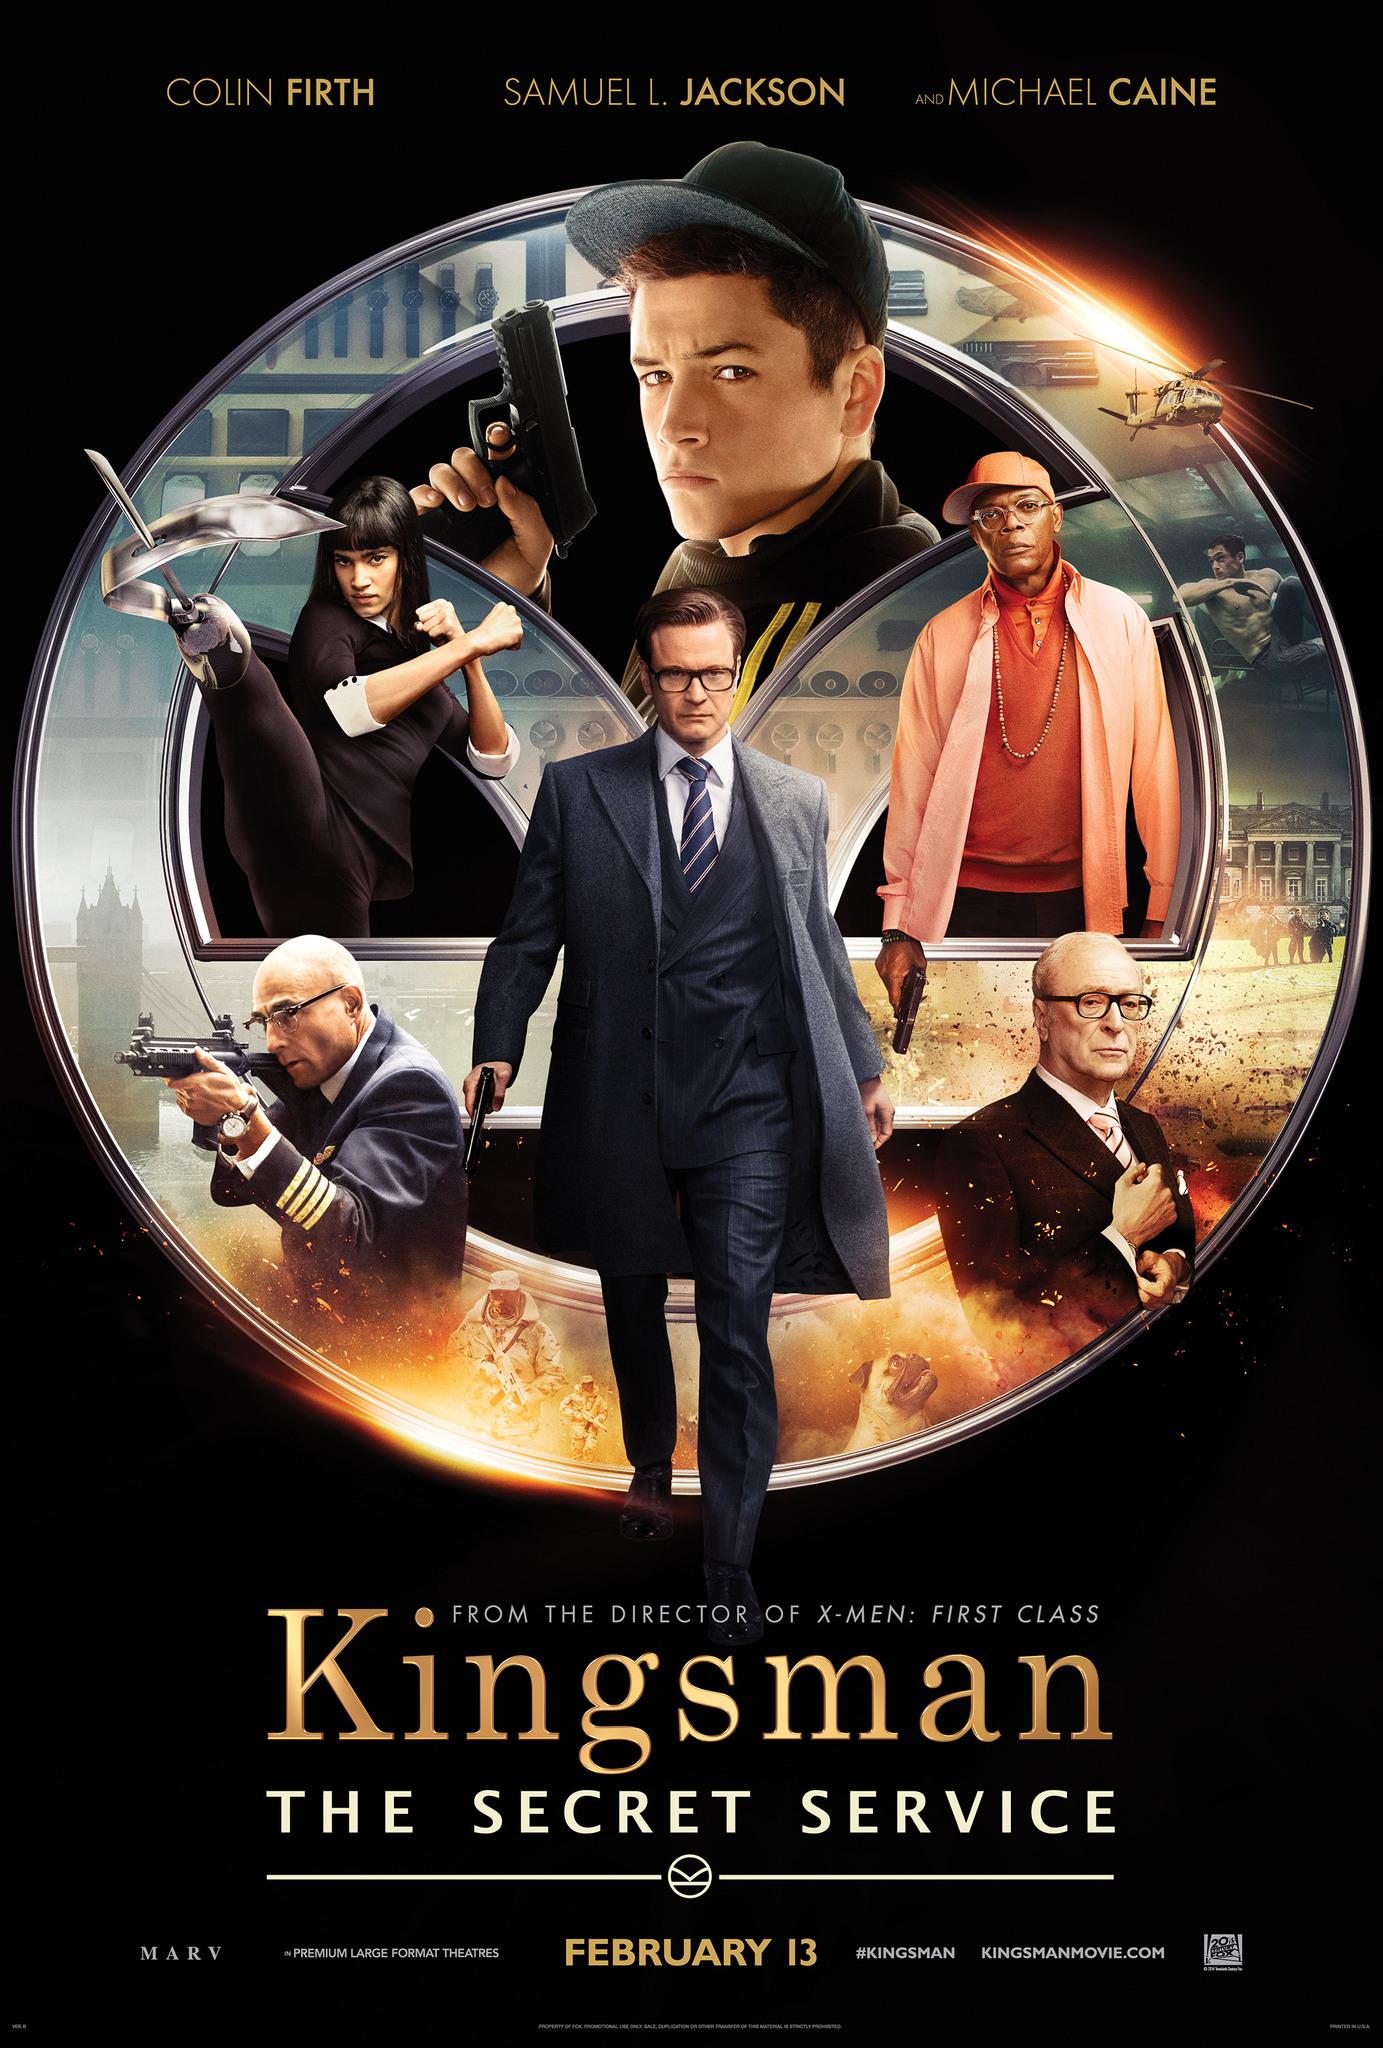 Kingsman The Secret Service 2014 Hindi Dubbed